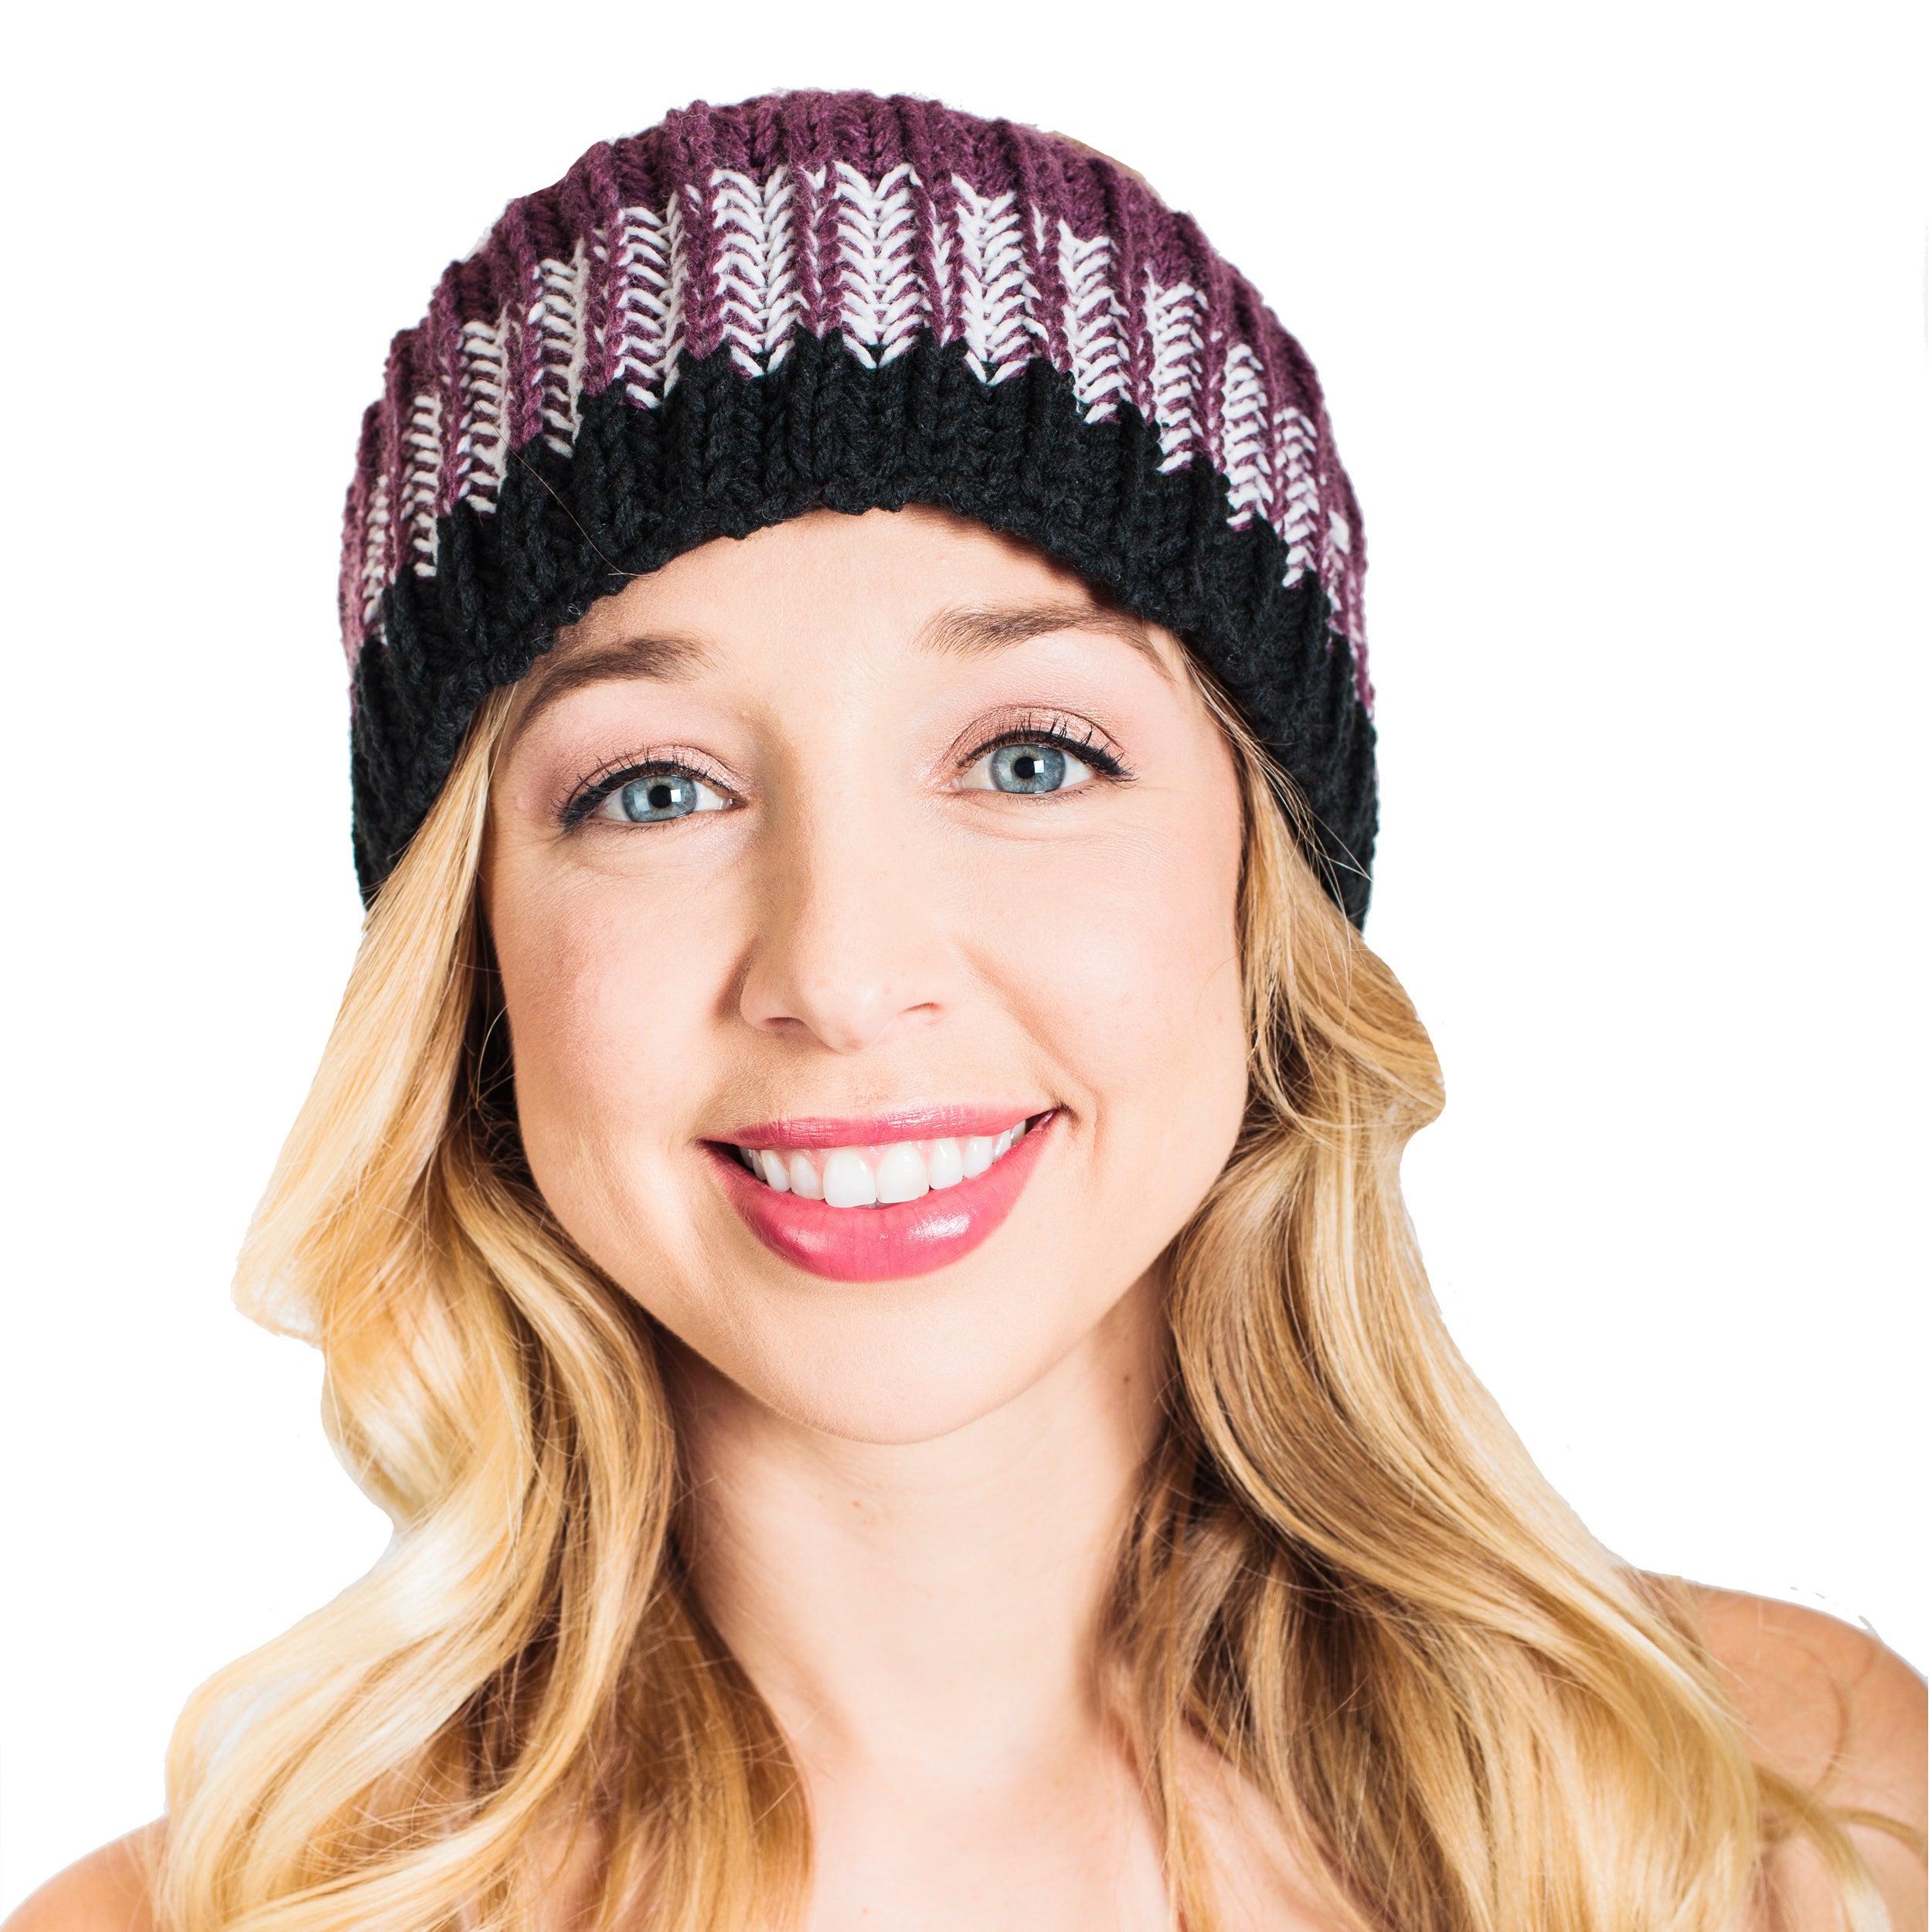 eff82f6ab6e Shop Handmade Women s Soft Knitted Warm Snowboarding Ski Headband ...